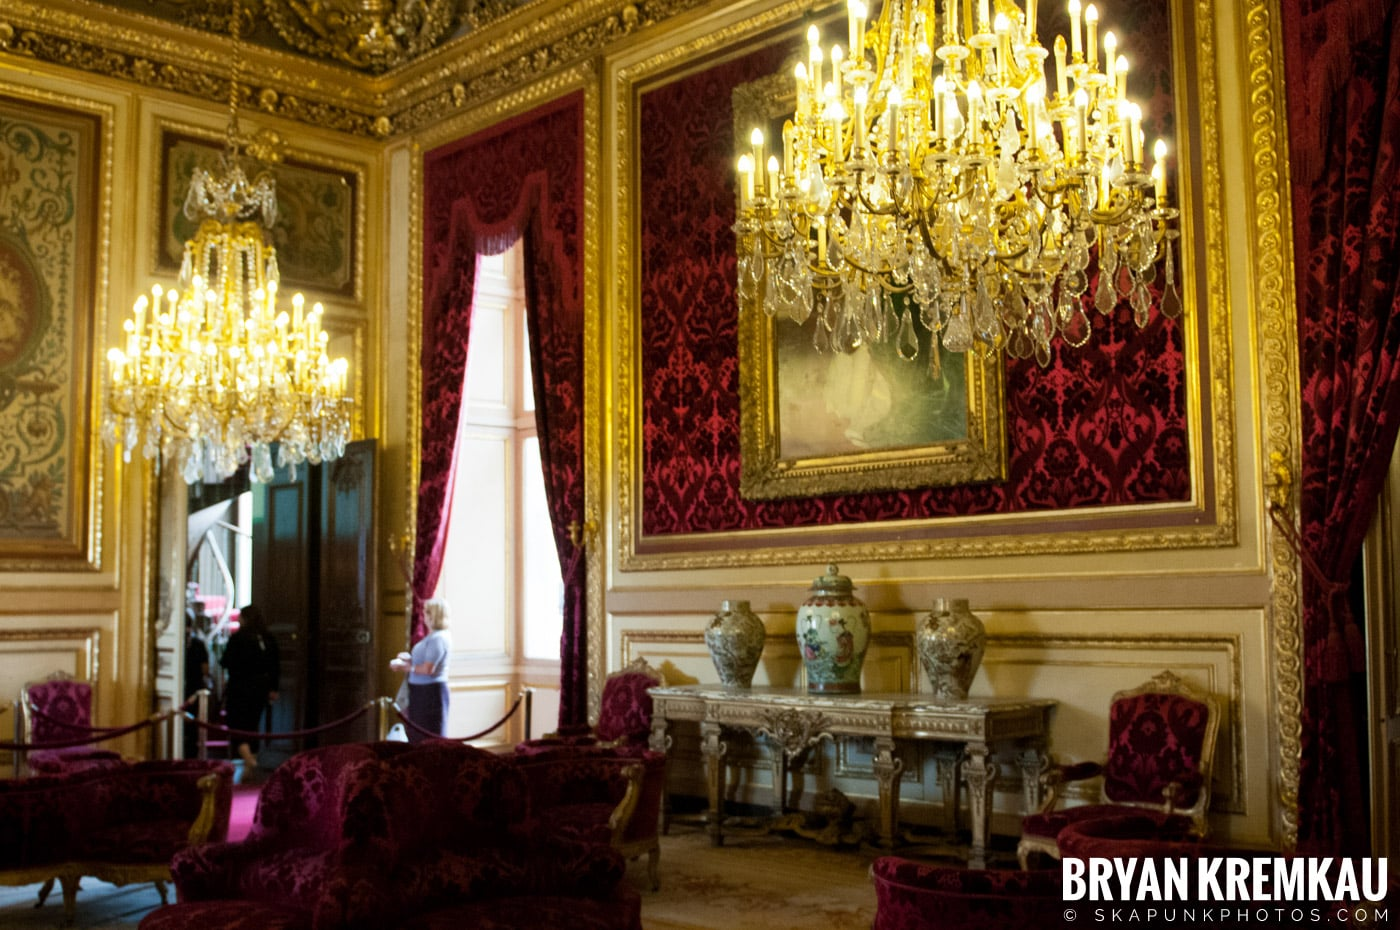 Paris, France Honeymoon - Day 3 - 7.20.11 (63)